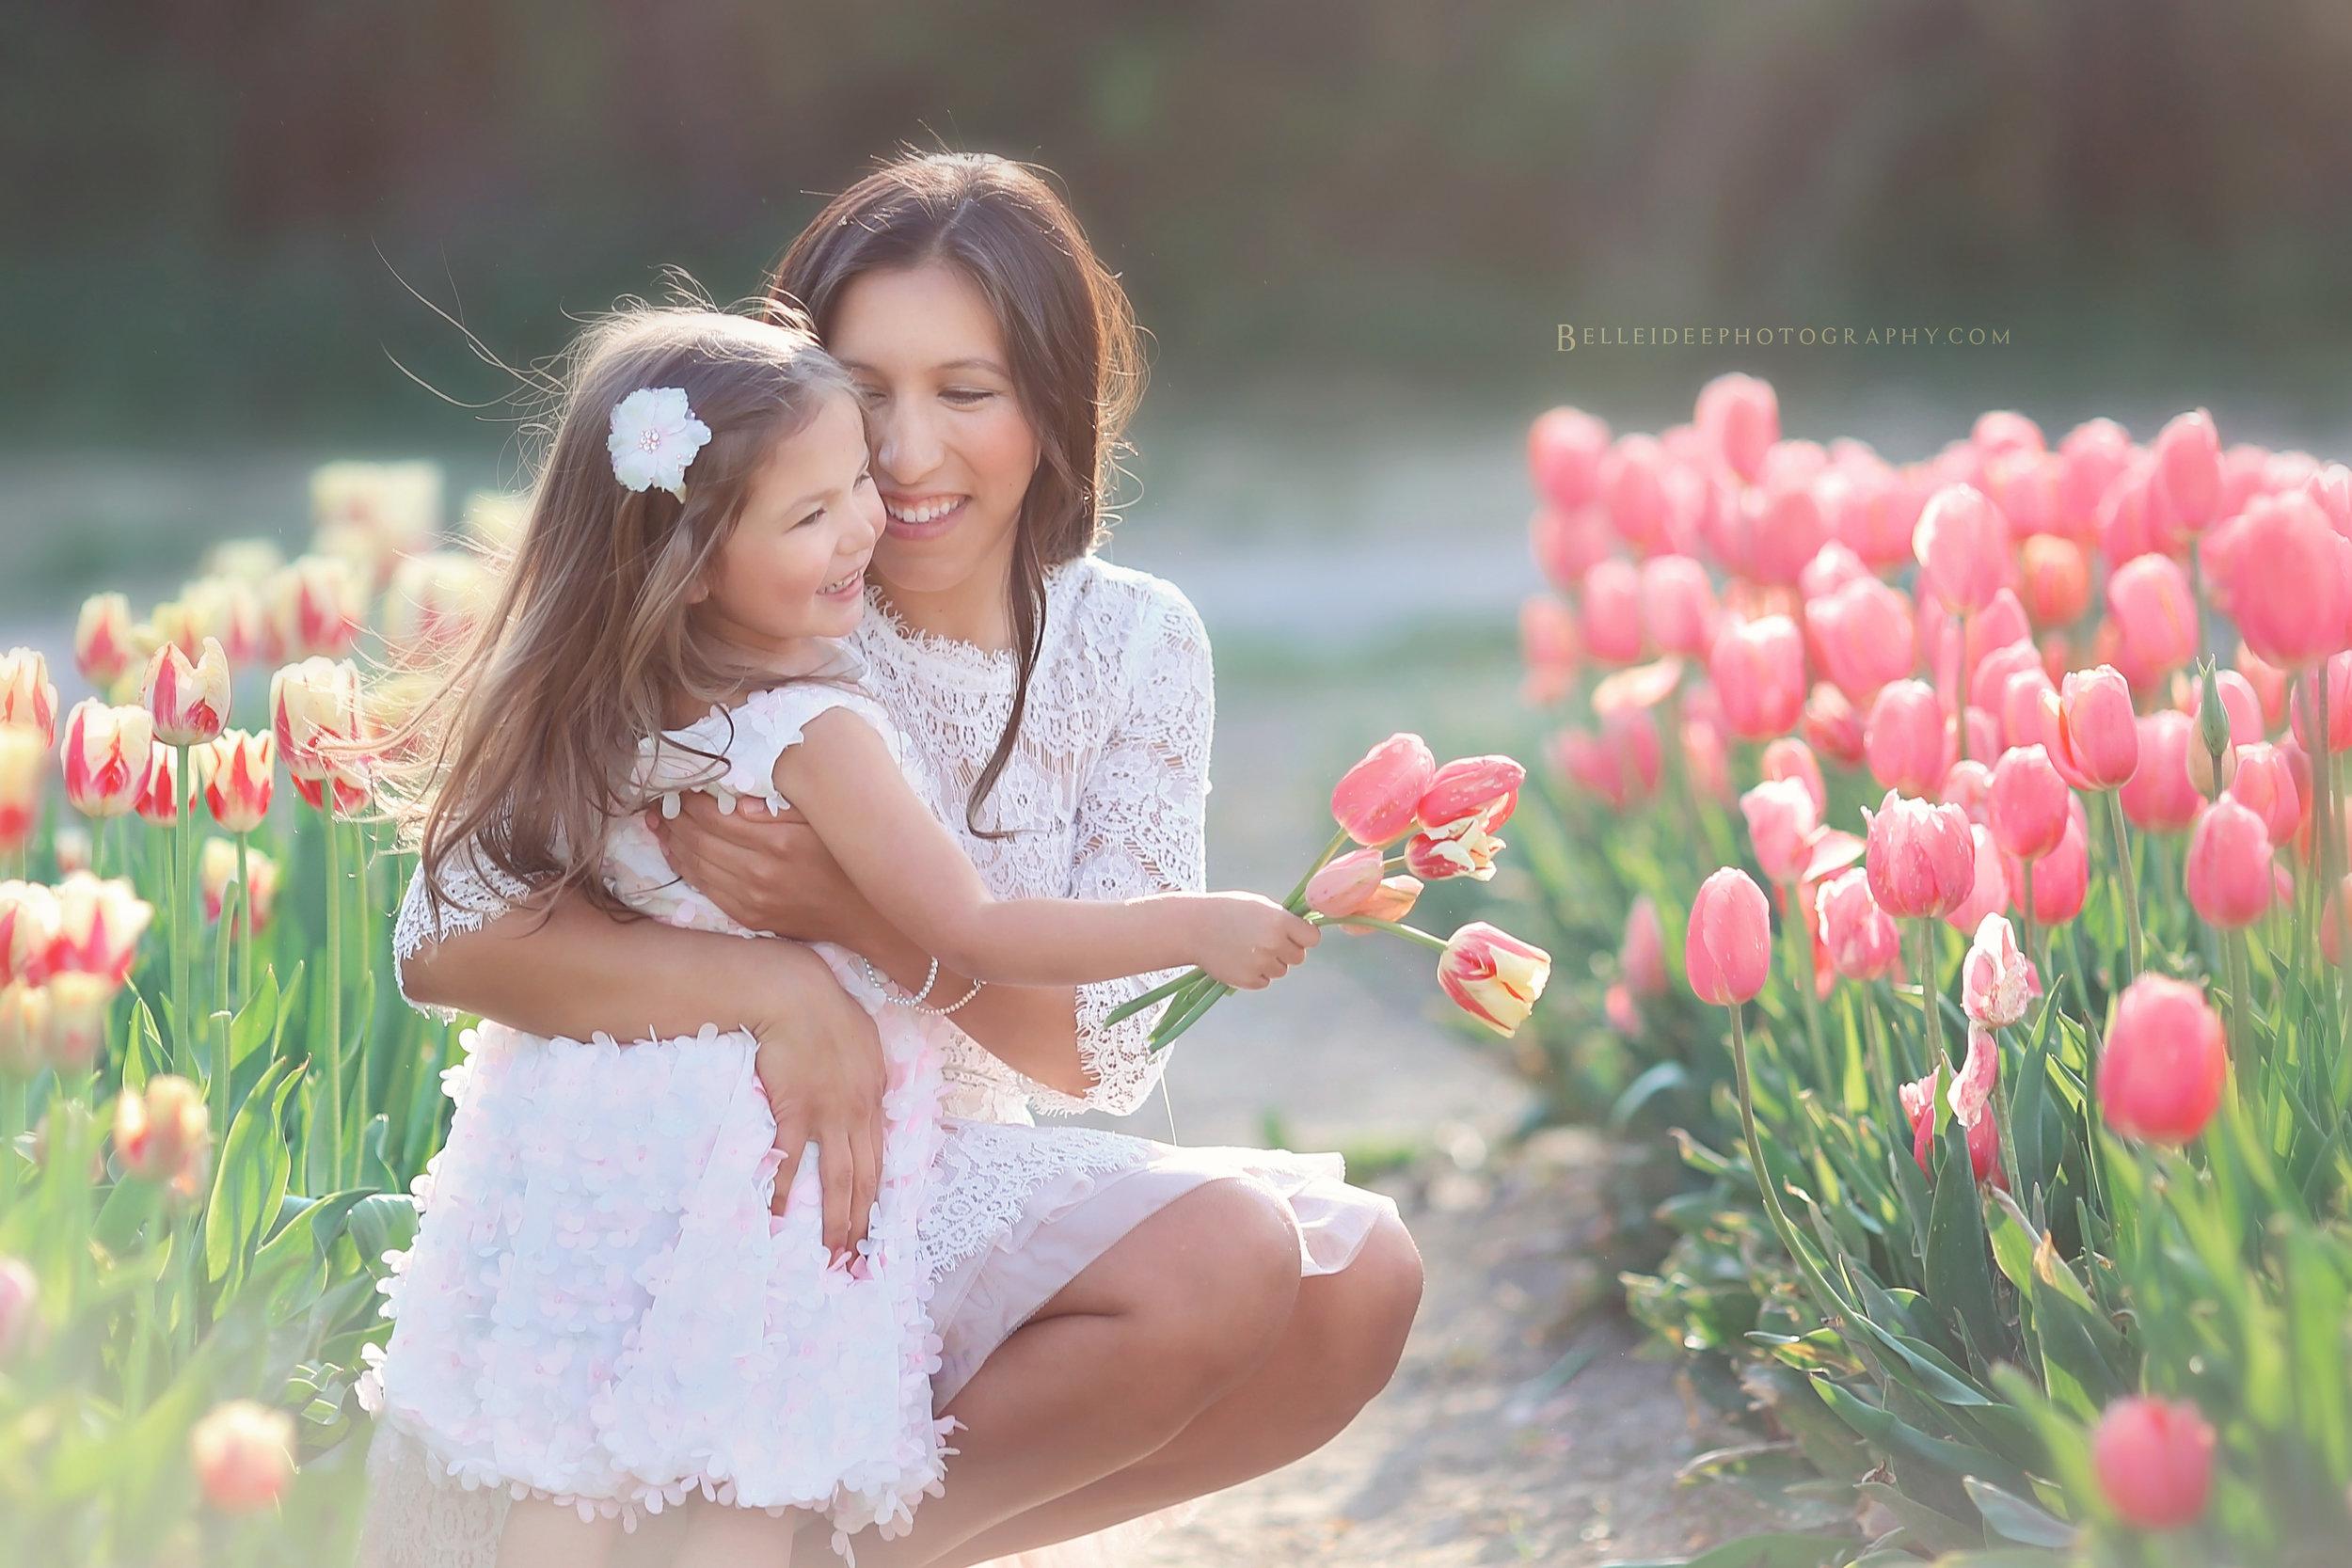 Mom & Daughter Photographer in Buffalo, NY